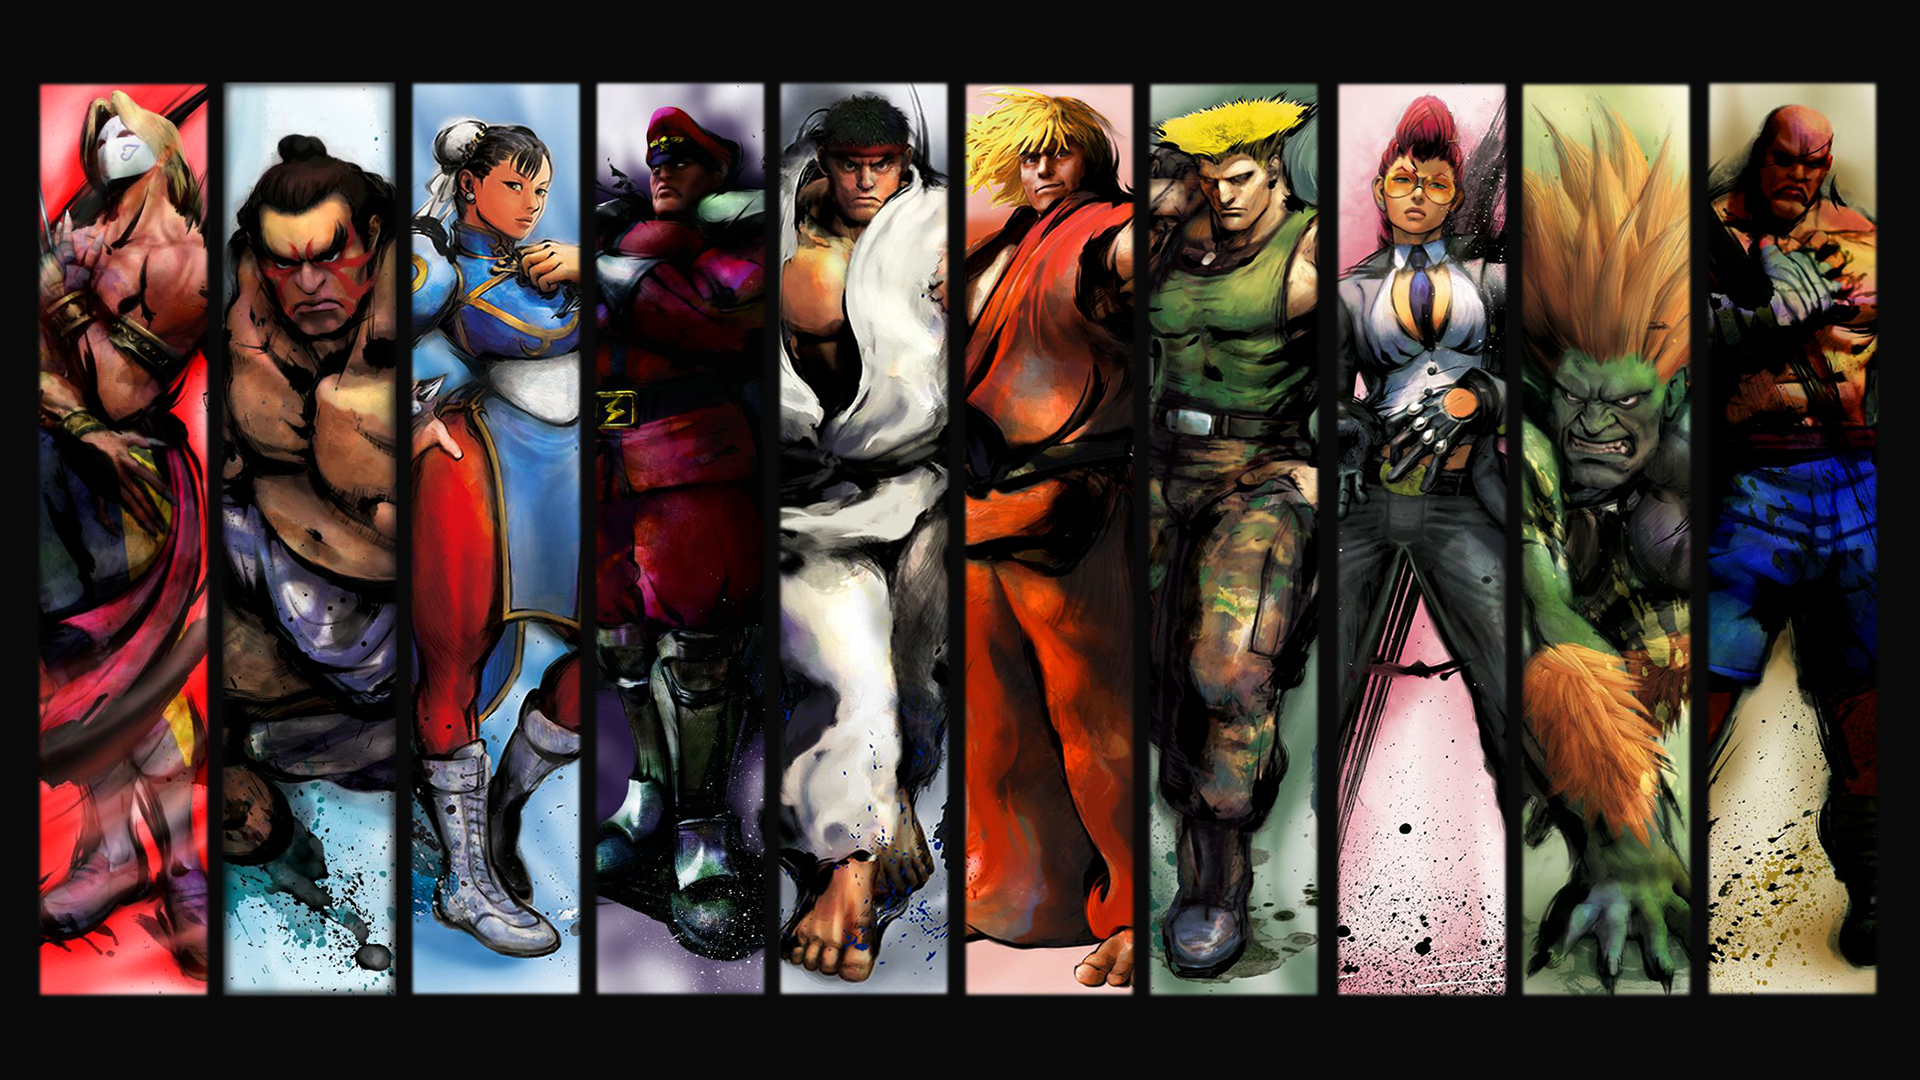 Street Fighter 5 Wallpaper: 249 Street Fighter HD Wallpapers